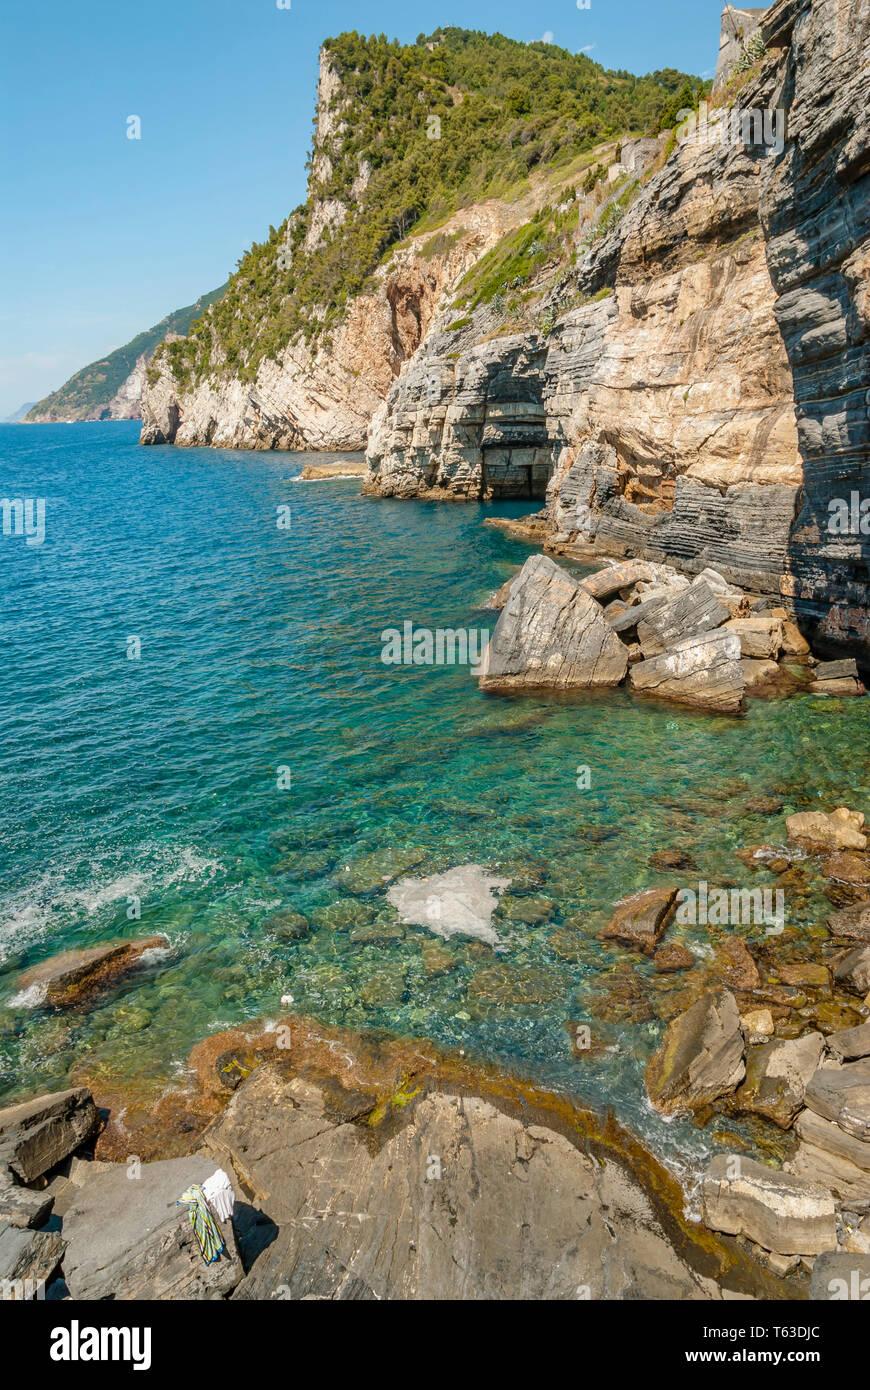 Byron Cave, Coastline of Portovenere, Cinque Terre National Park, Liguria, Italy   Byron Cave an der Kueste von Portovenere, Cinque Terre Nationalpark - Stock Image